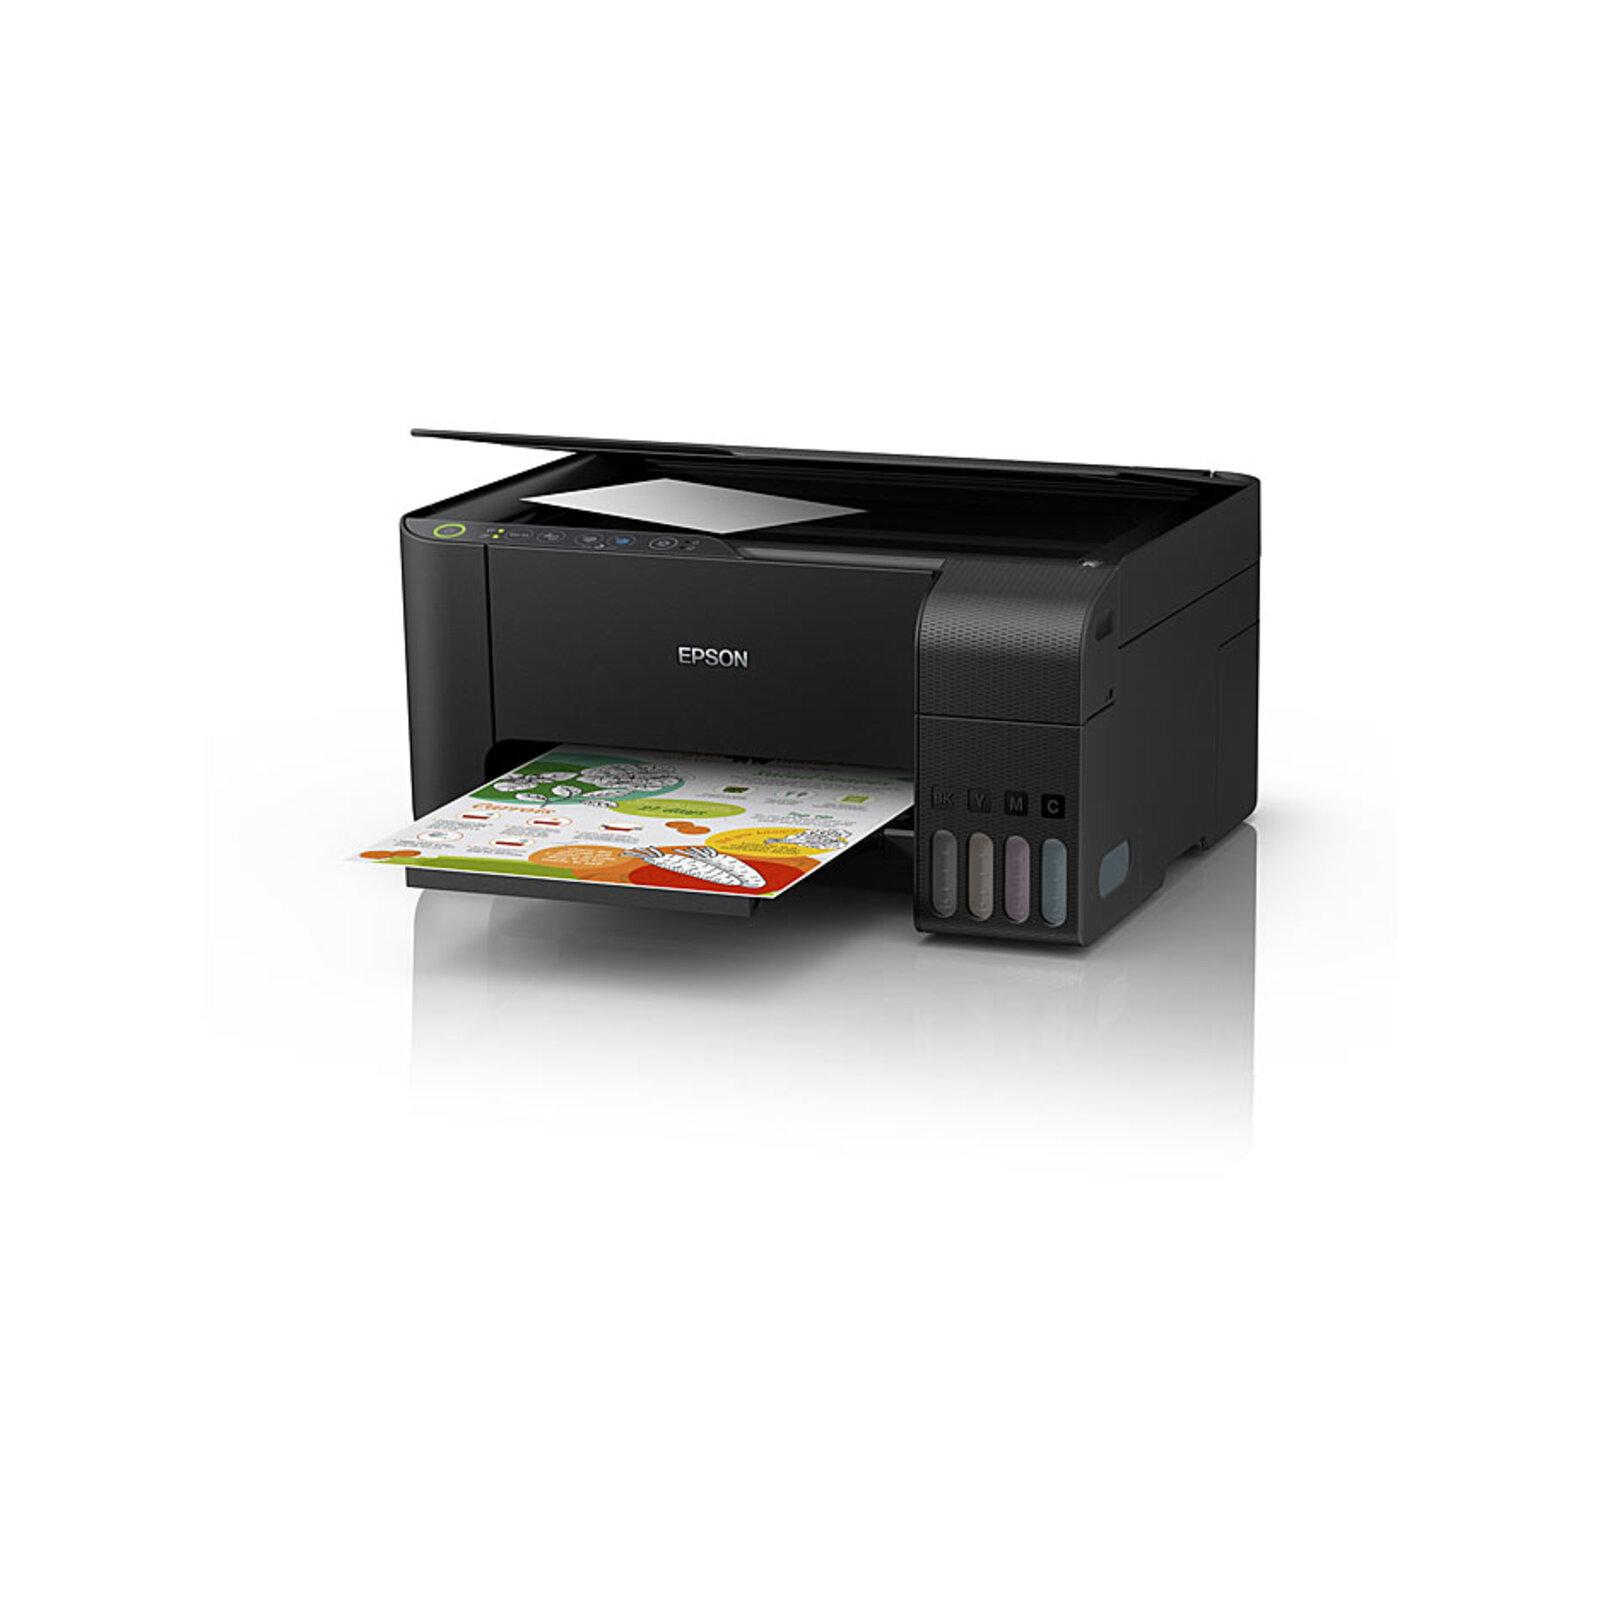 Epson EcoTank ET-2710 Inkjet MFP - Print, Copy, Scan, Wi-Fi